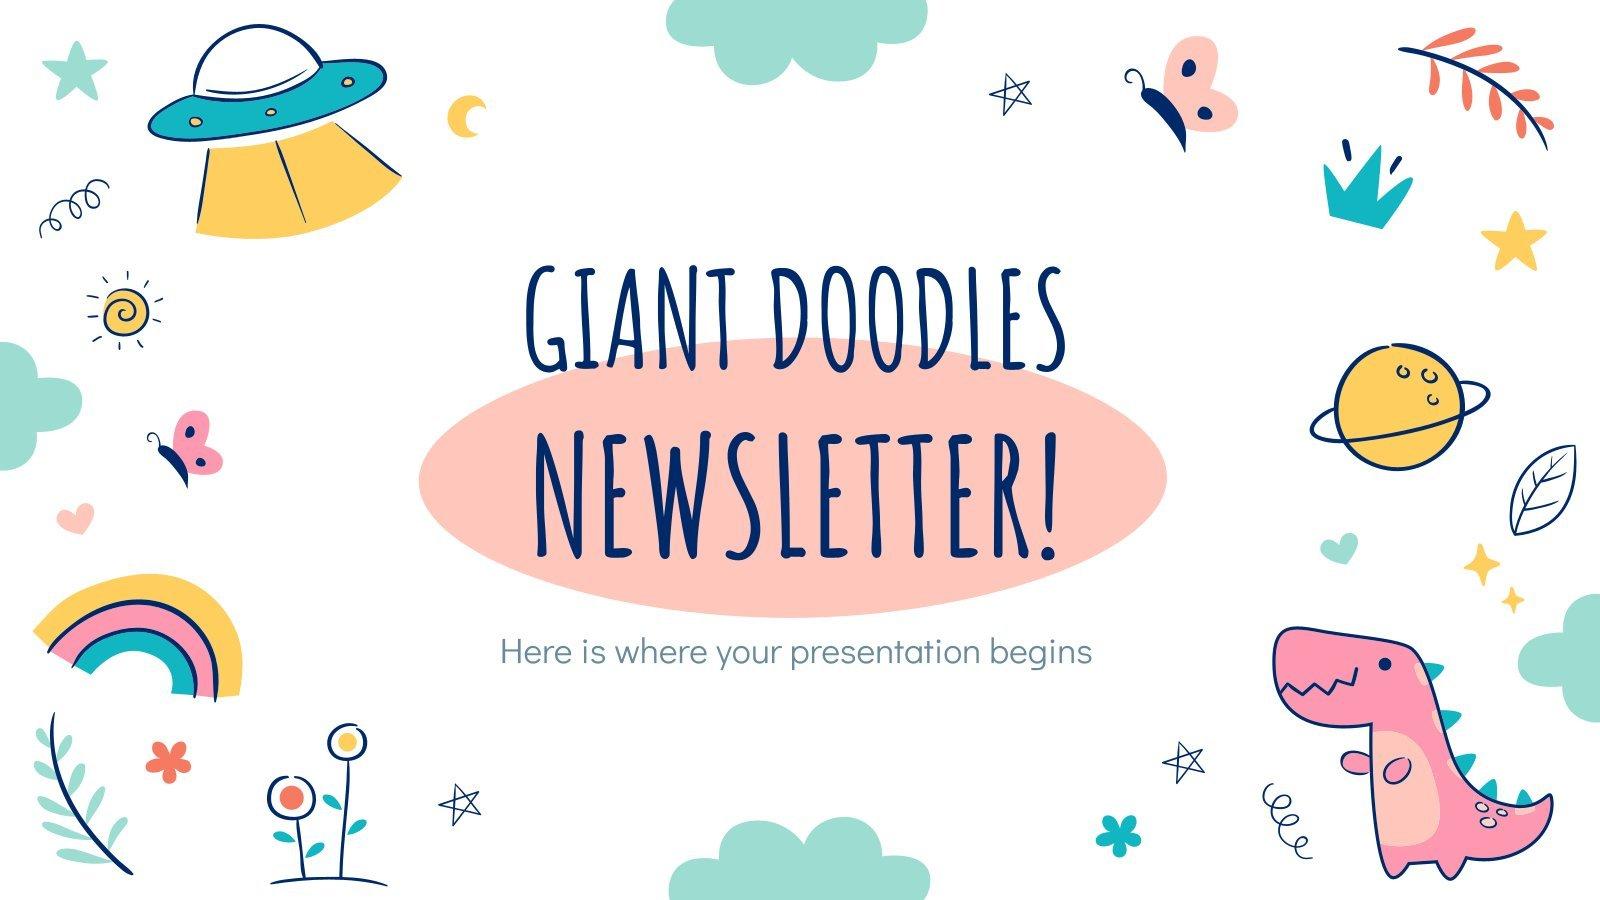 Giant Doodles Newsletter presentation template